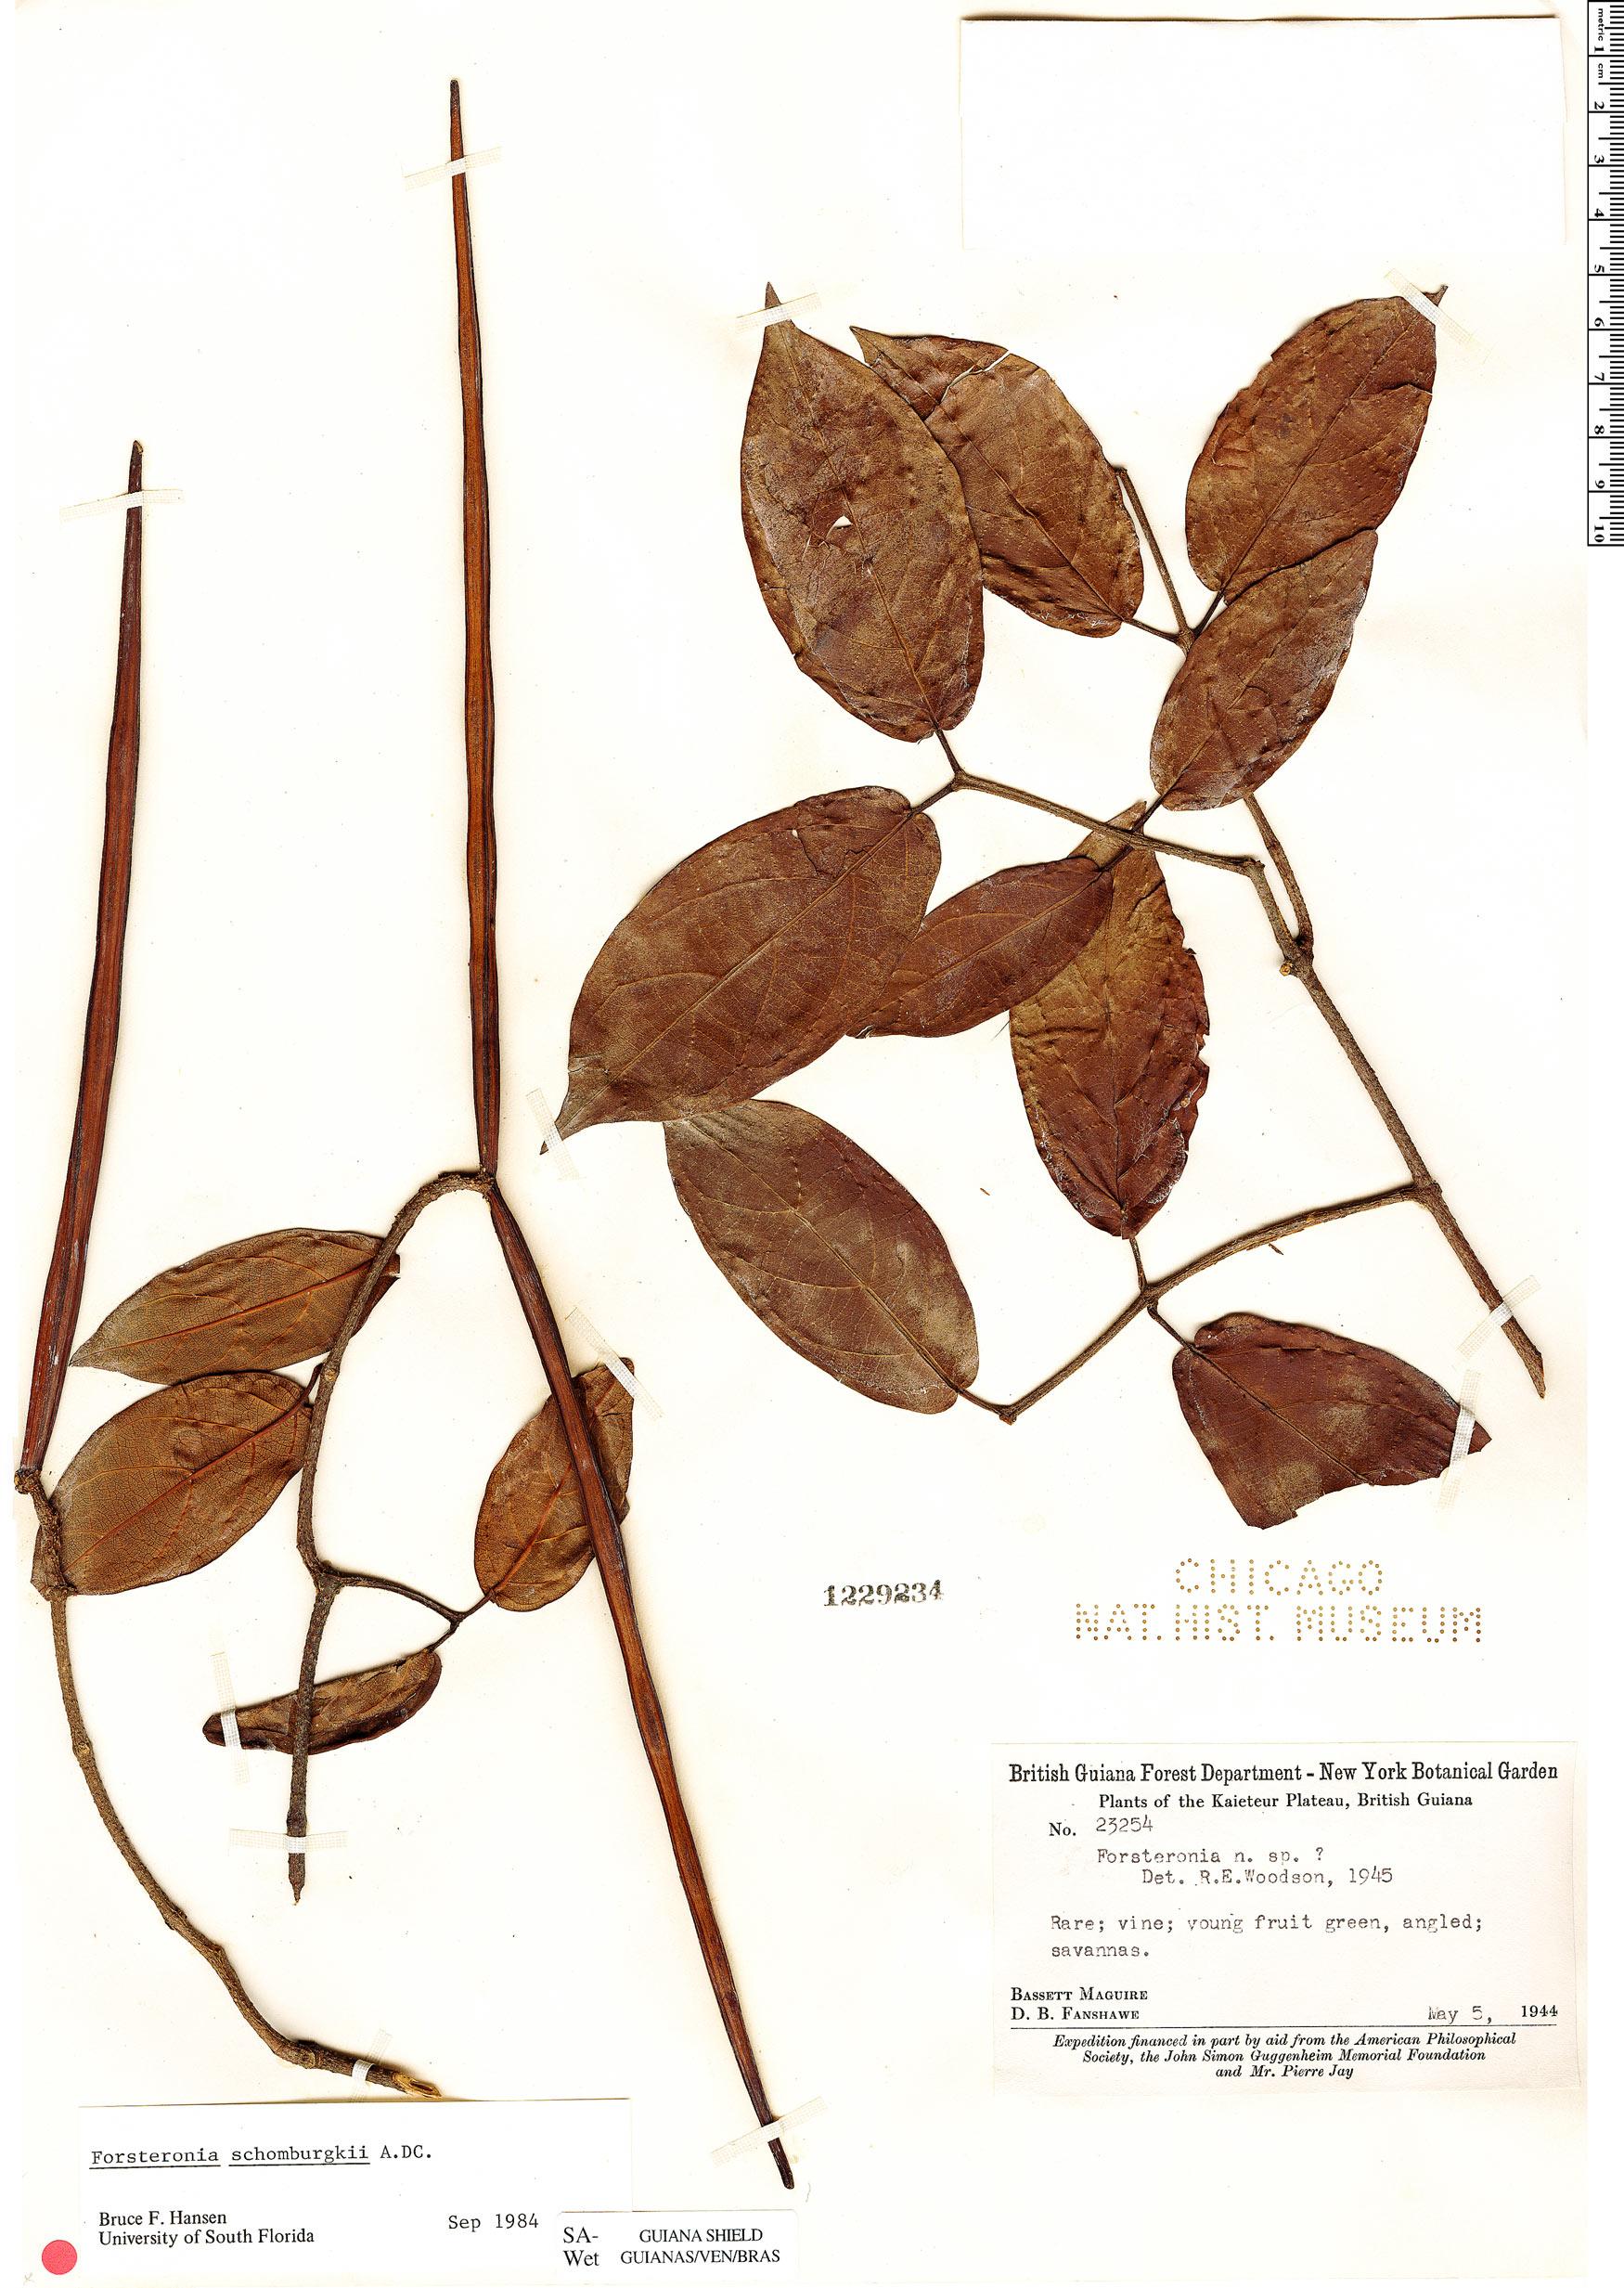 Specimen: Forsteronia schomburgkii